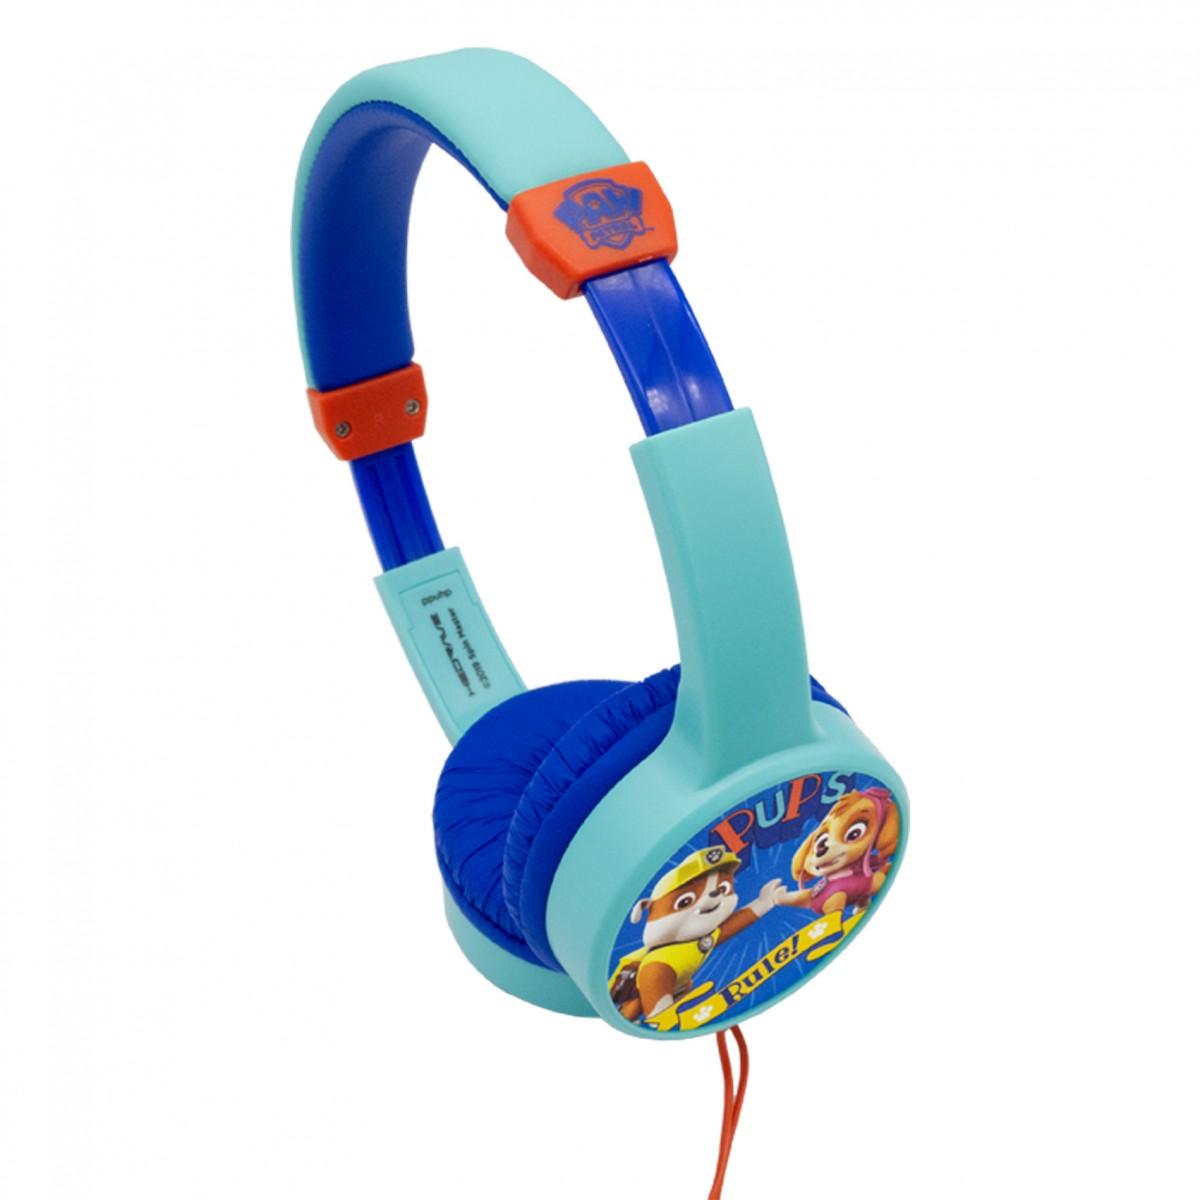 Nickelodeon Paw Patrol Uni Headphone Nickelodeon Headphones E